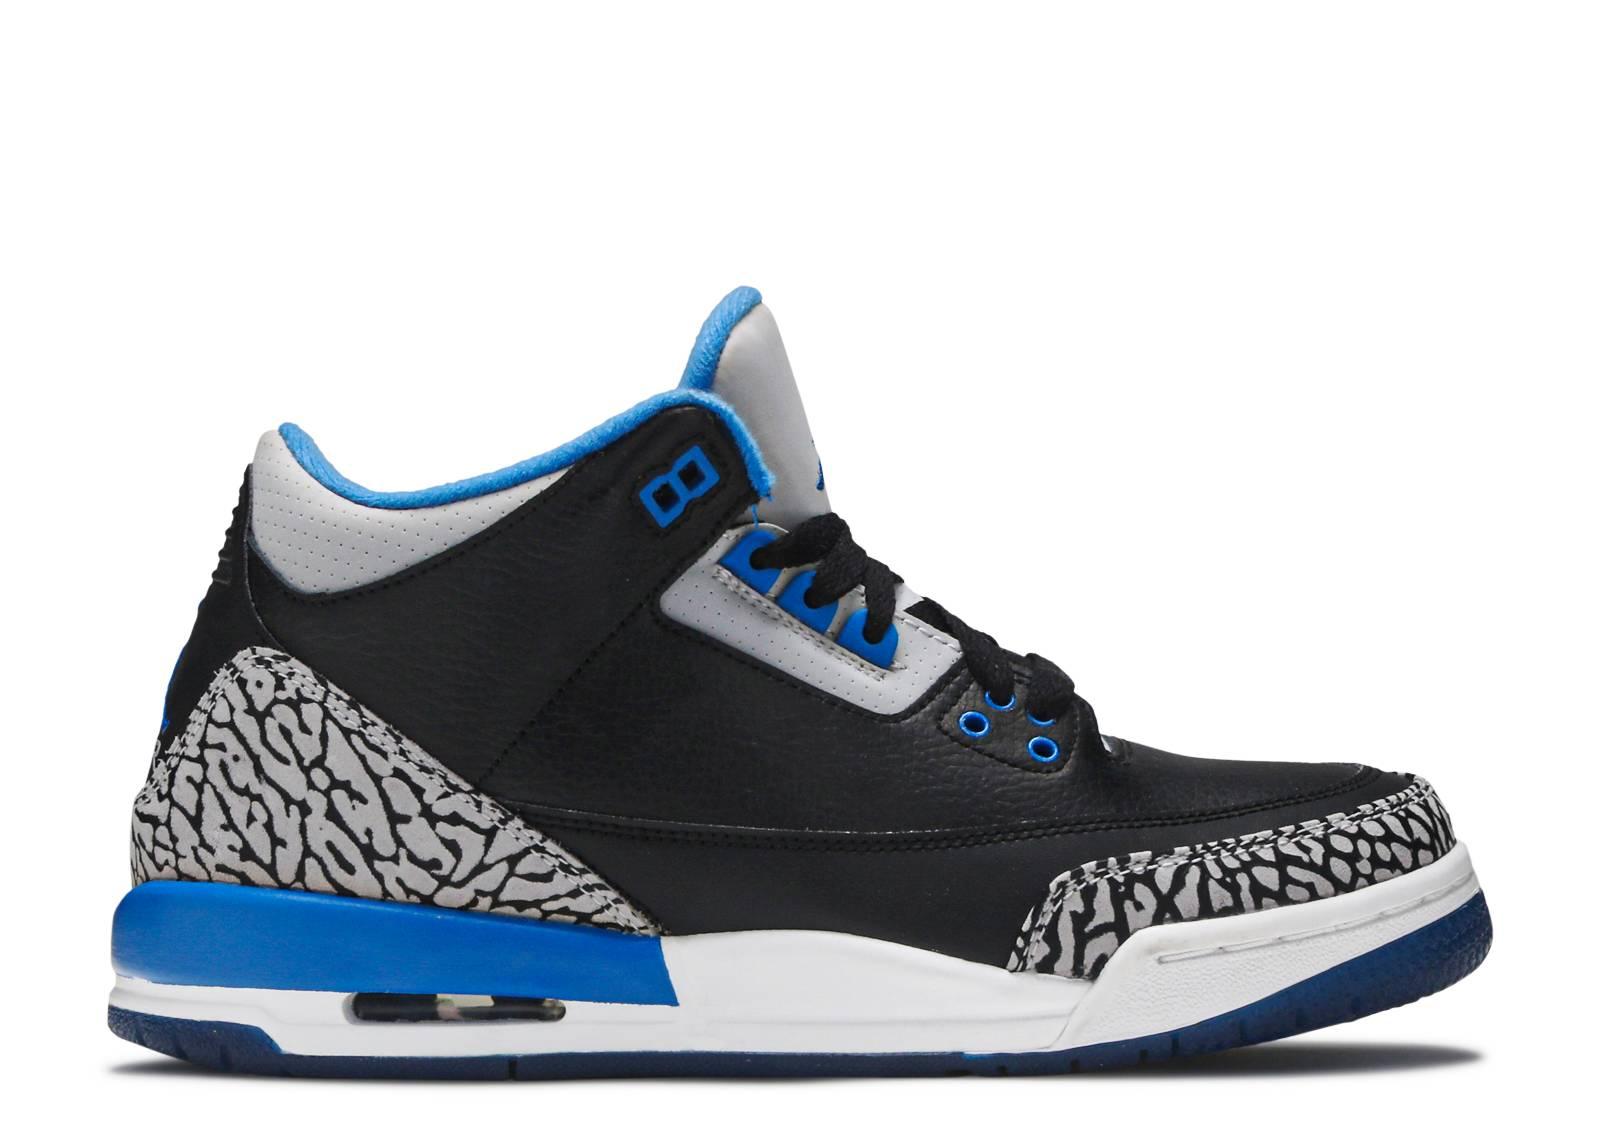 179ebd08aa ... wolf grigio 136064 007 26750 9f052; wholesale air jordan 3 retro bg gs  sport blue air jordan 398614 007 black sport blue